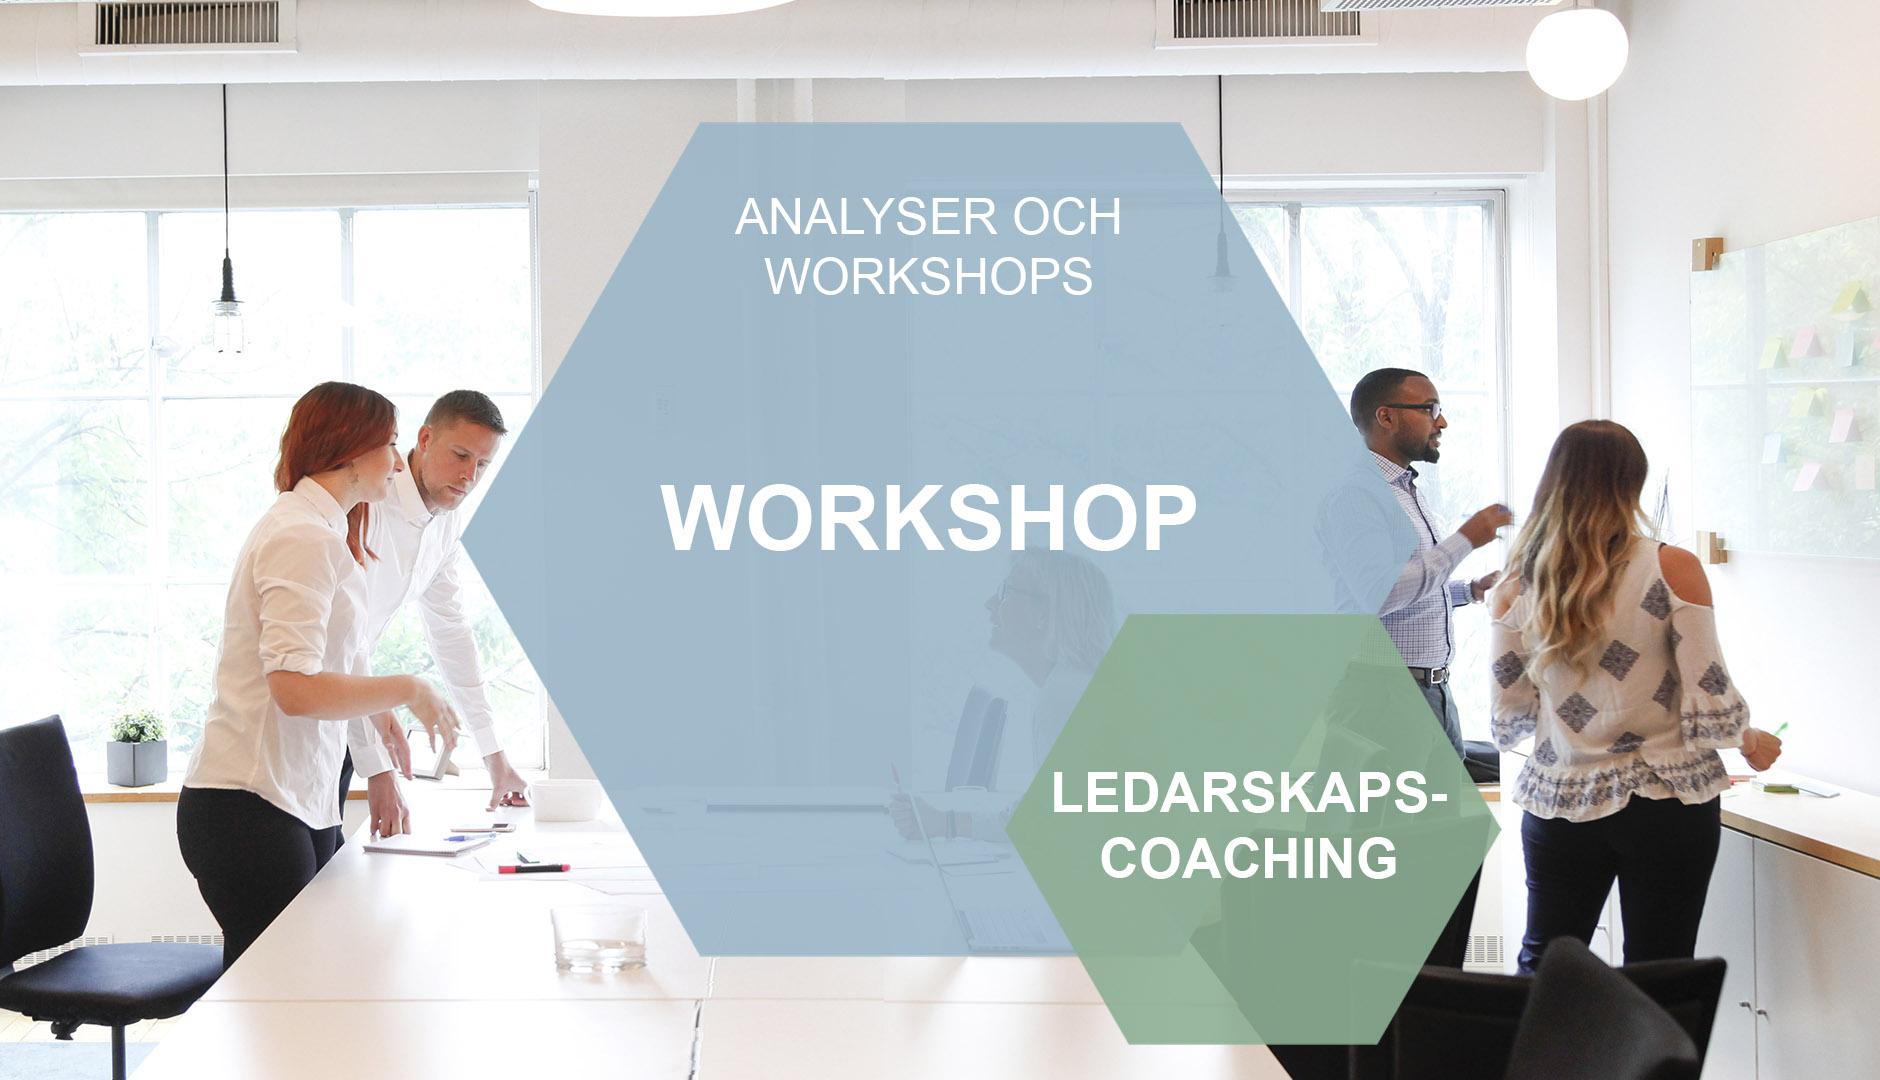 Ledarskapscoaching i hexagon mot bakgrund av människor i workshop